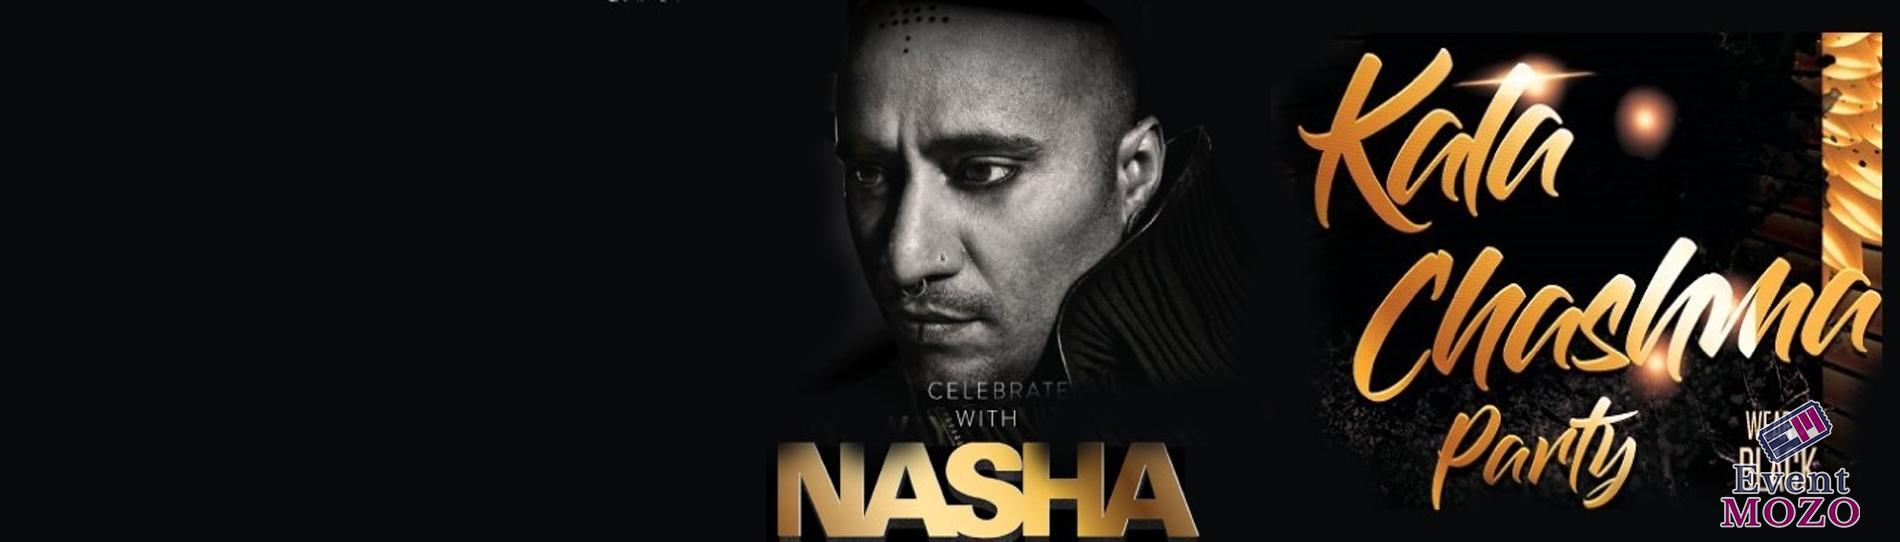 EventMozo Kala Chashma Party w/ DJ Nasha - Radio5 Events